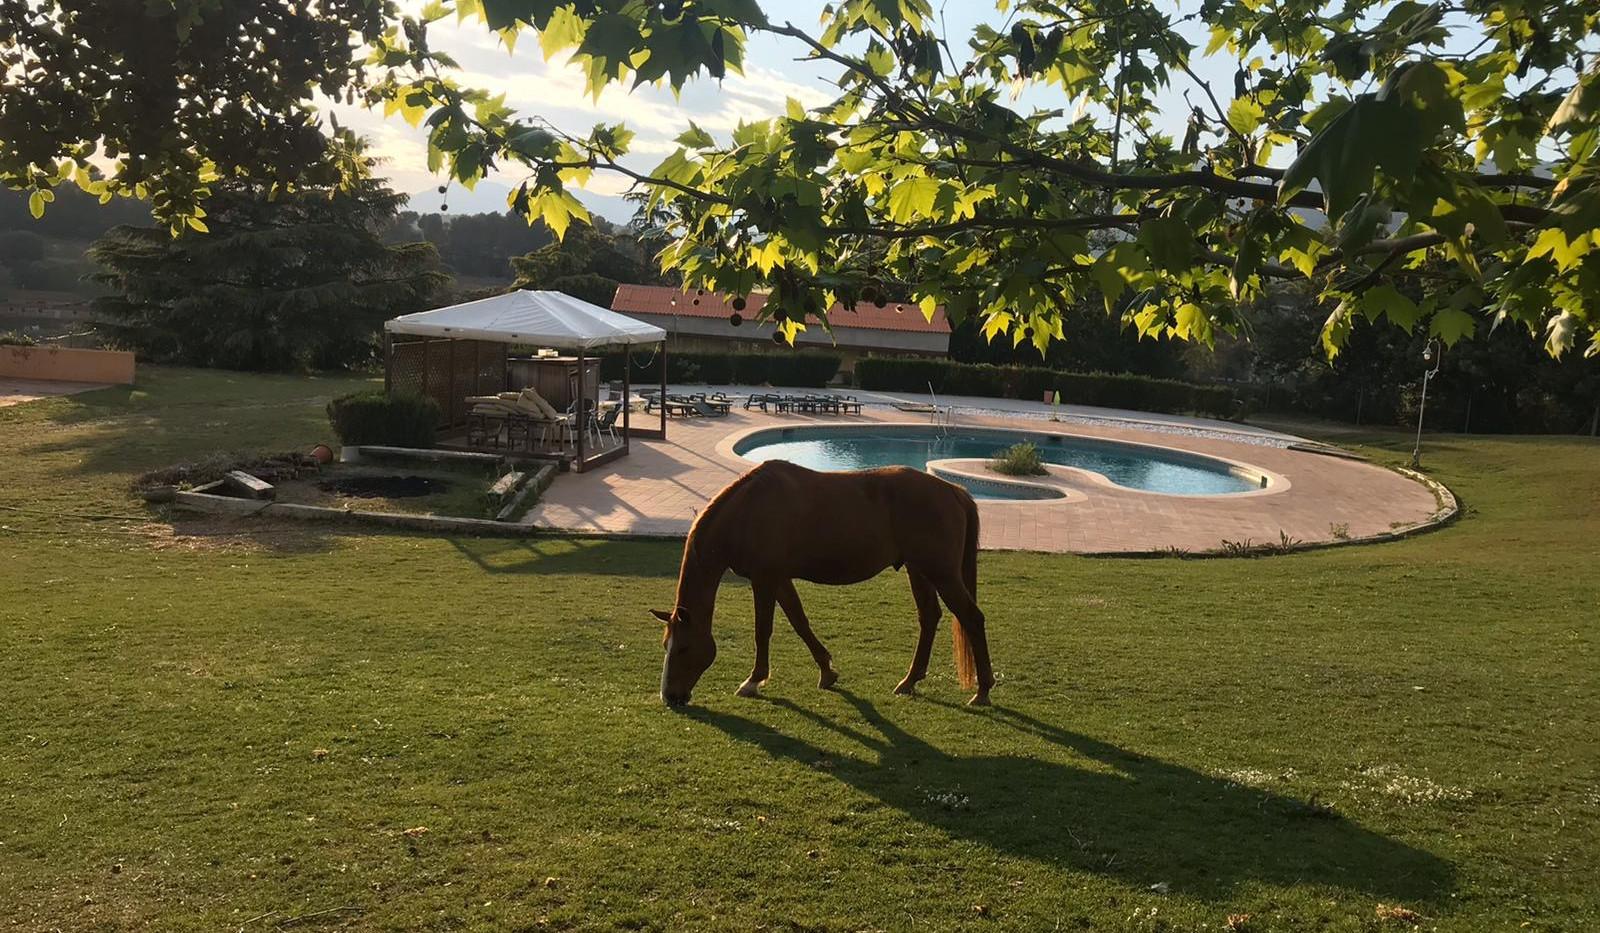 caballo, jardin, piscina.JPG